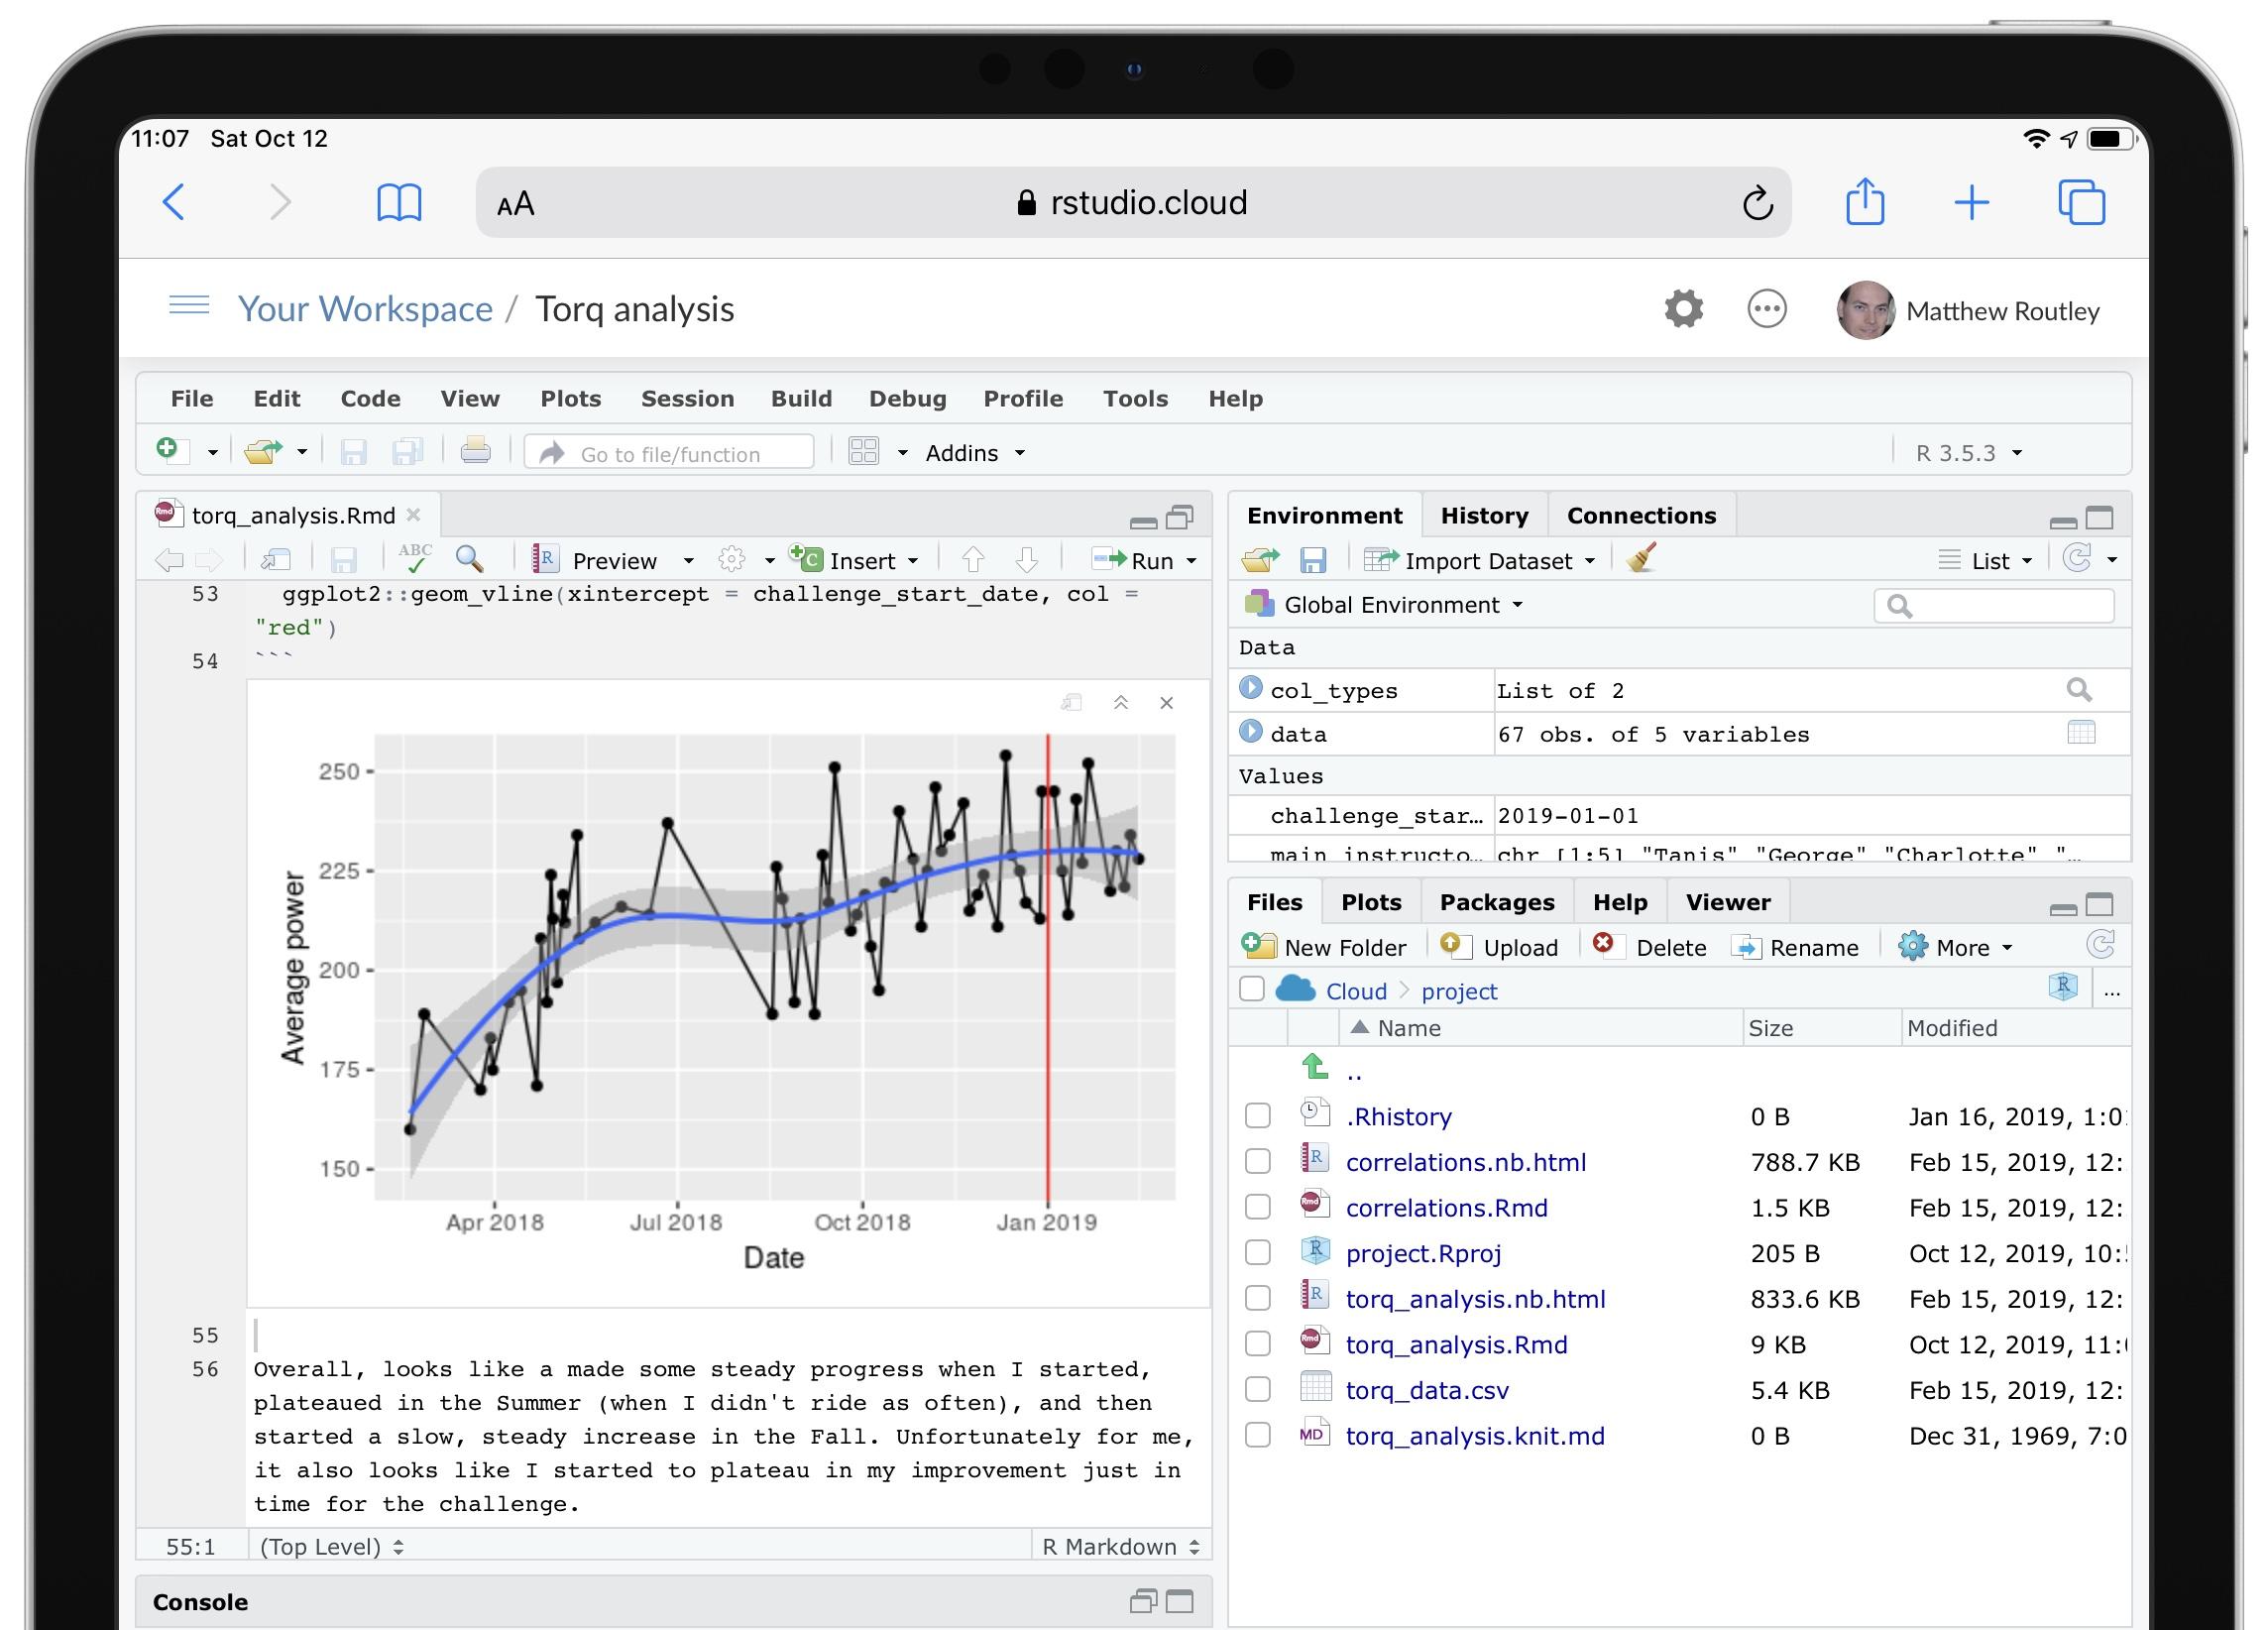 A screenshot of RStudio Cloud on the iPad